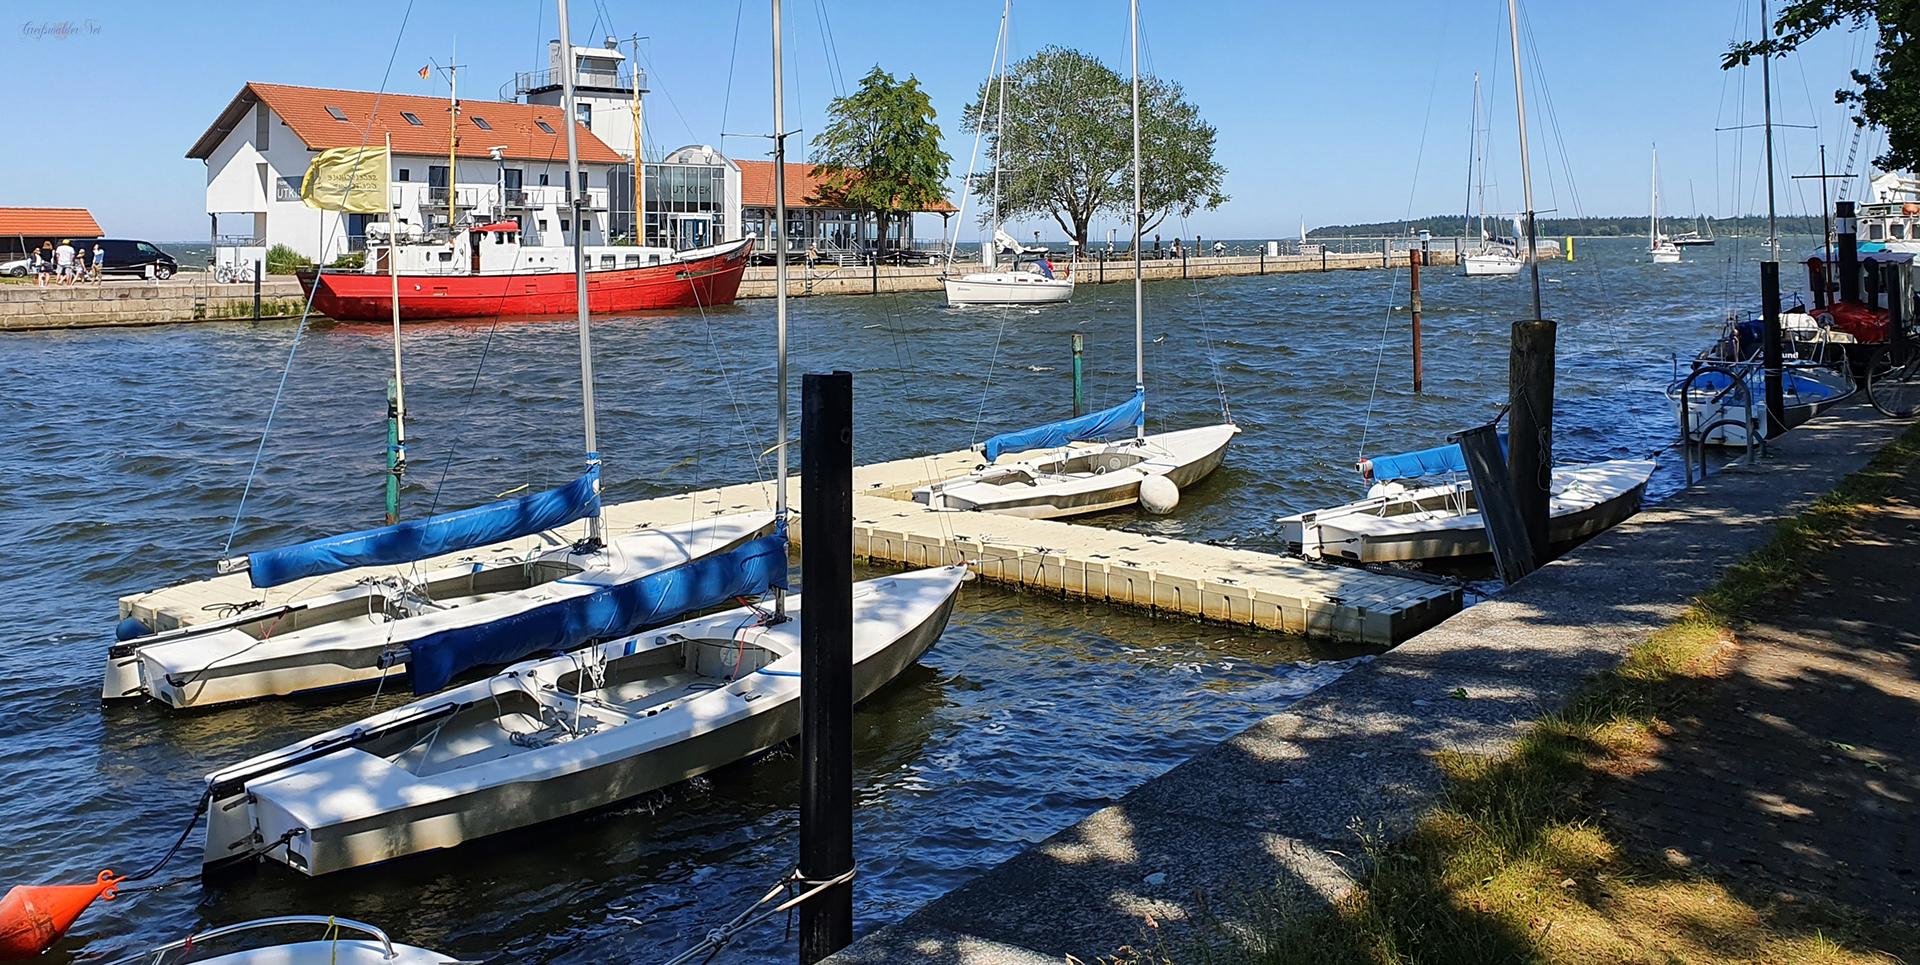 Sonntagnachmittag in Greifswald-Wieck